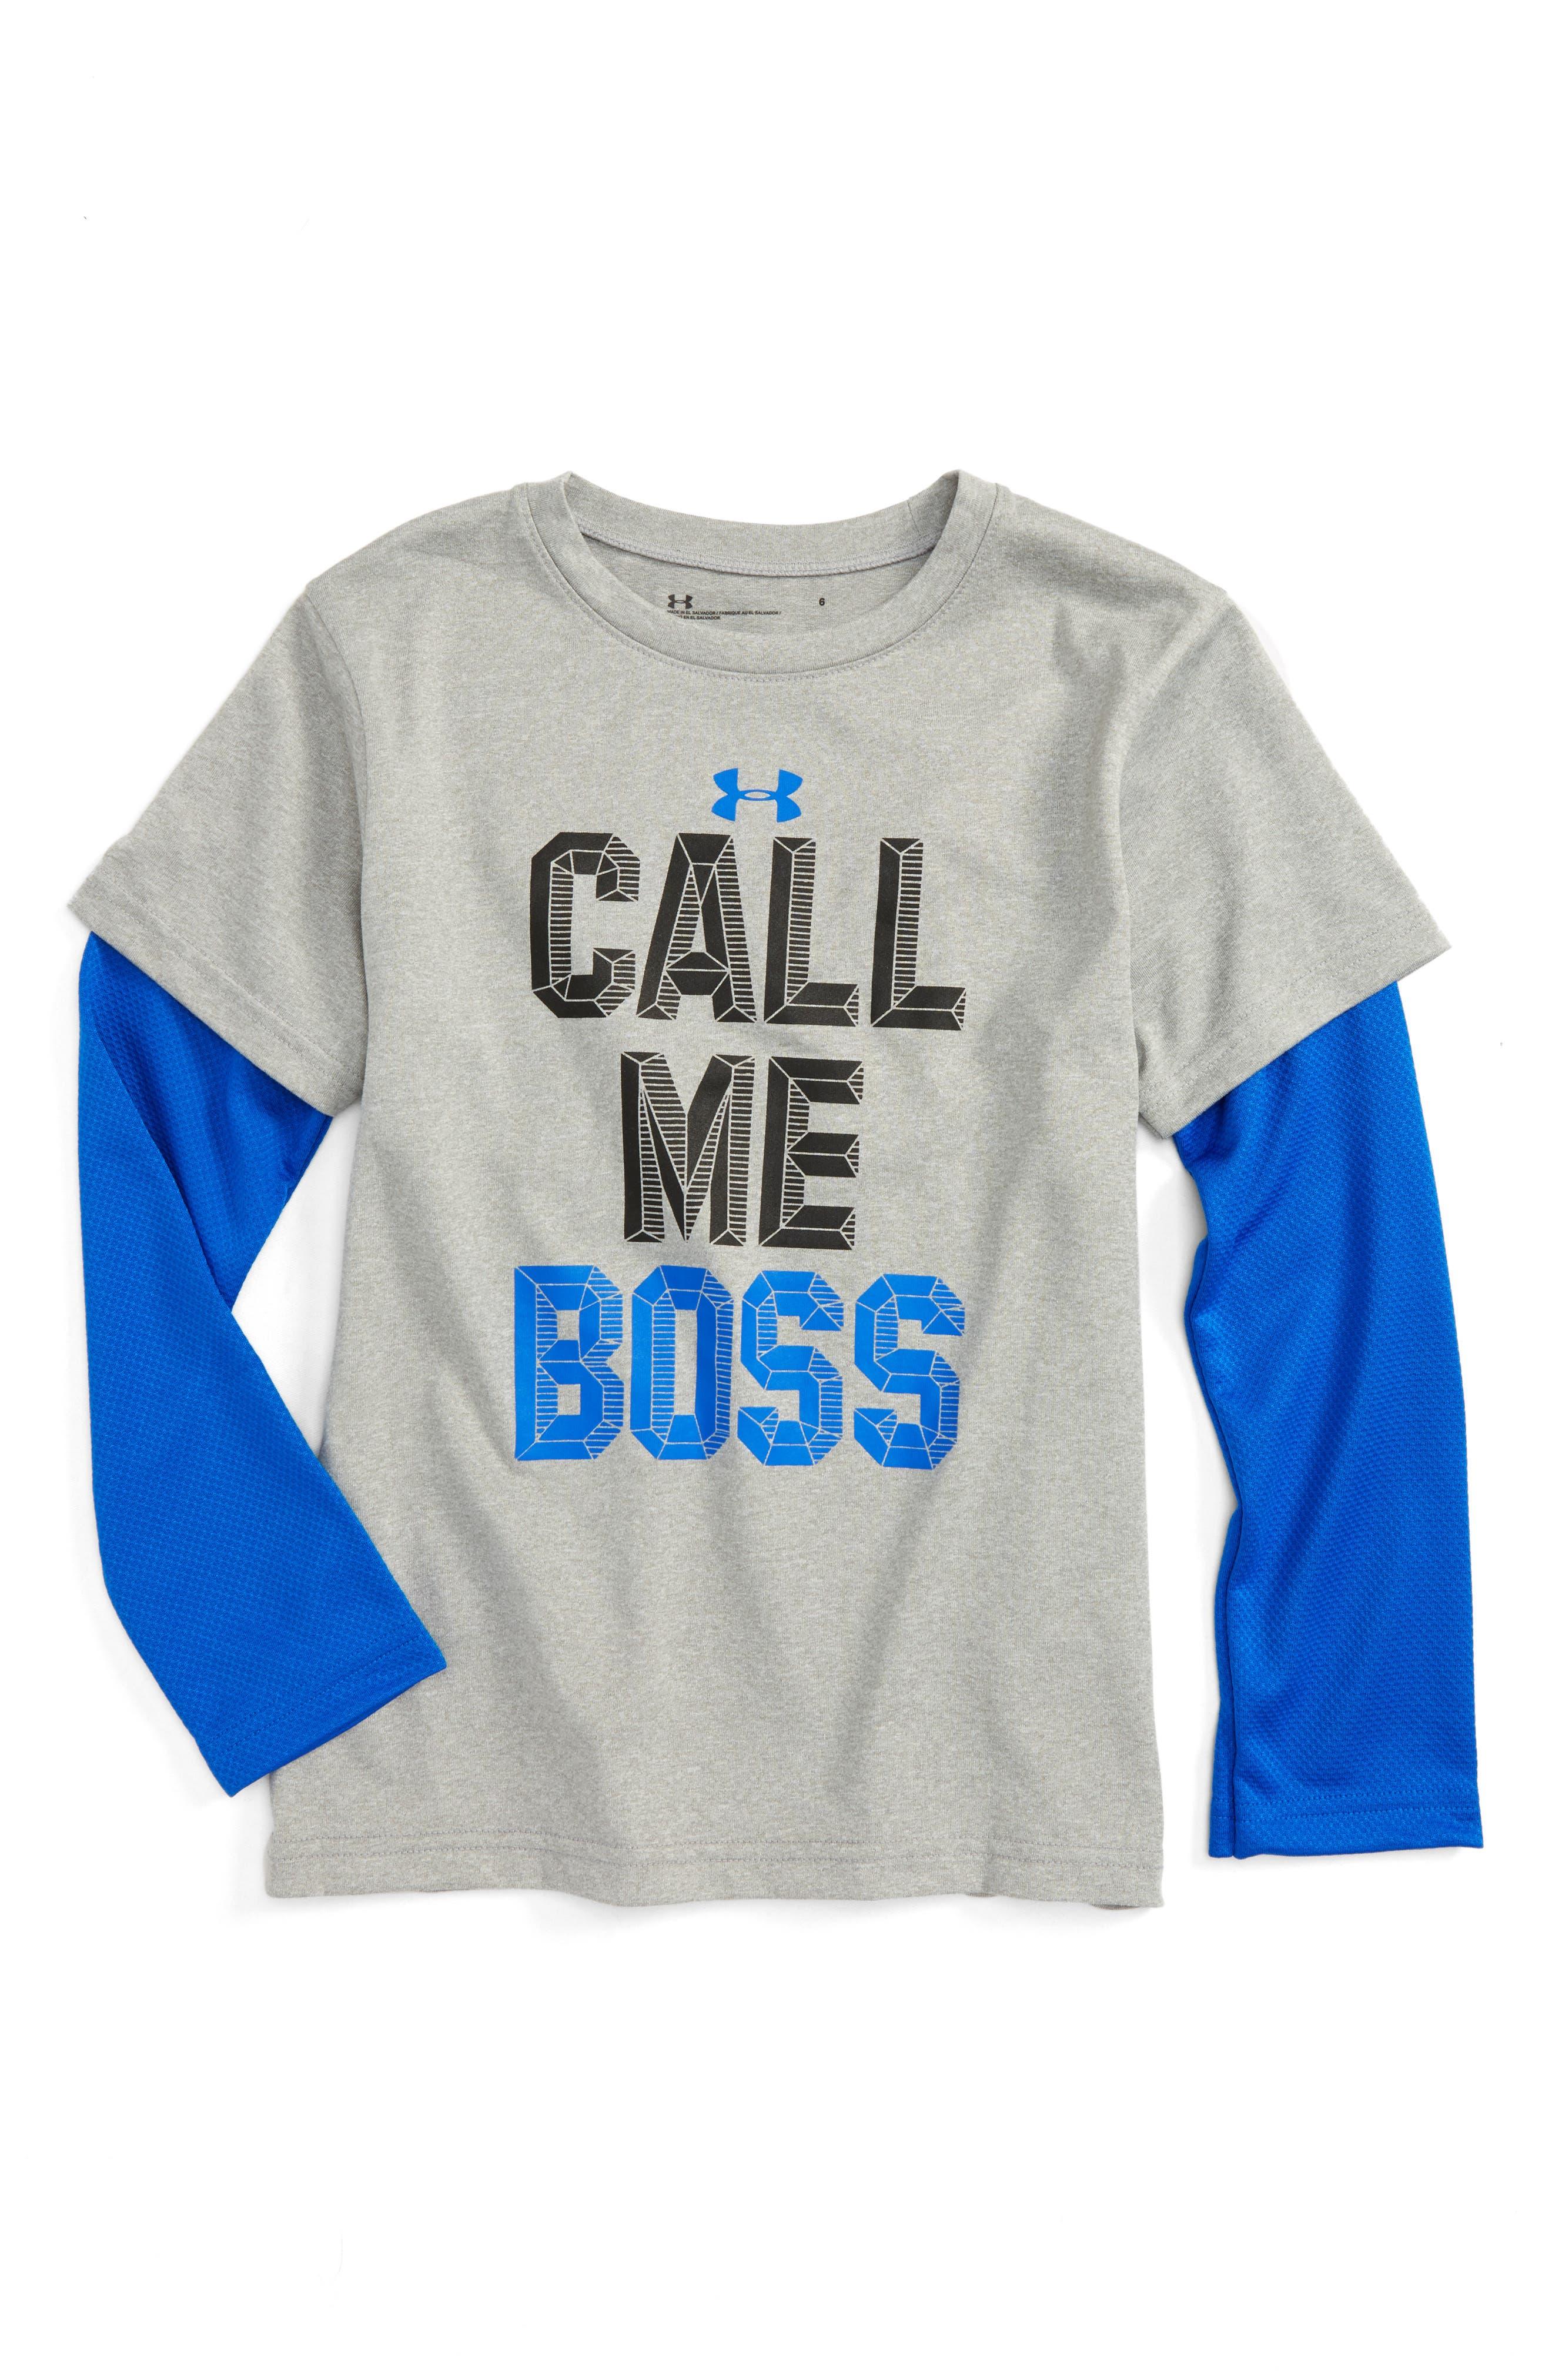 Main Image - Under Armour Call Me Boss - Slider Layered T-Shirt (Toddler Boys & Little Boys)